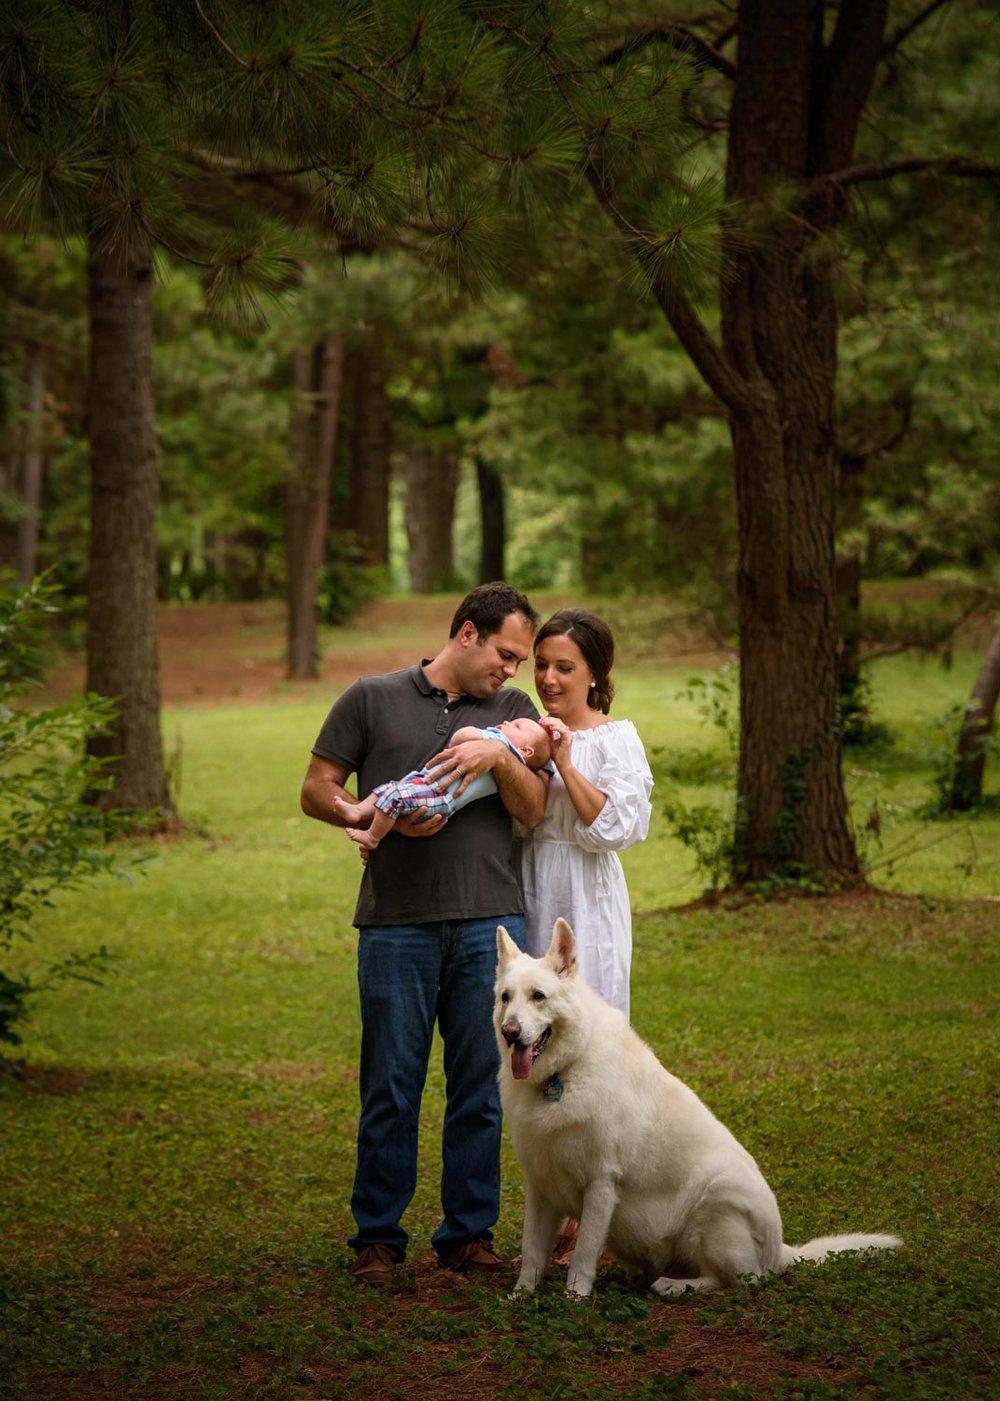 family-photography-Lexington-ky-studio-walz042.jpg